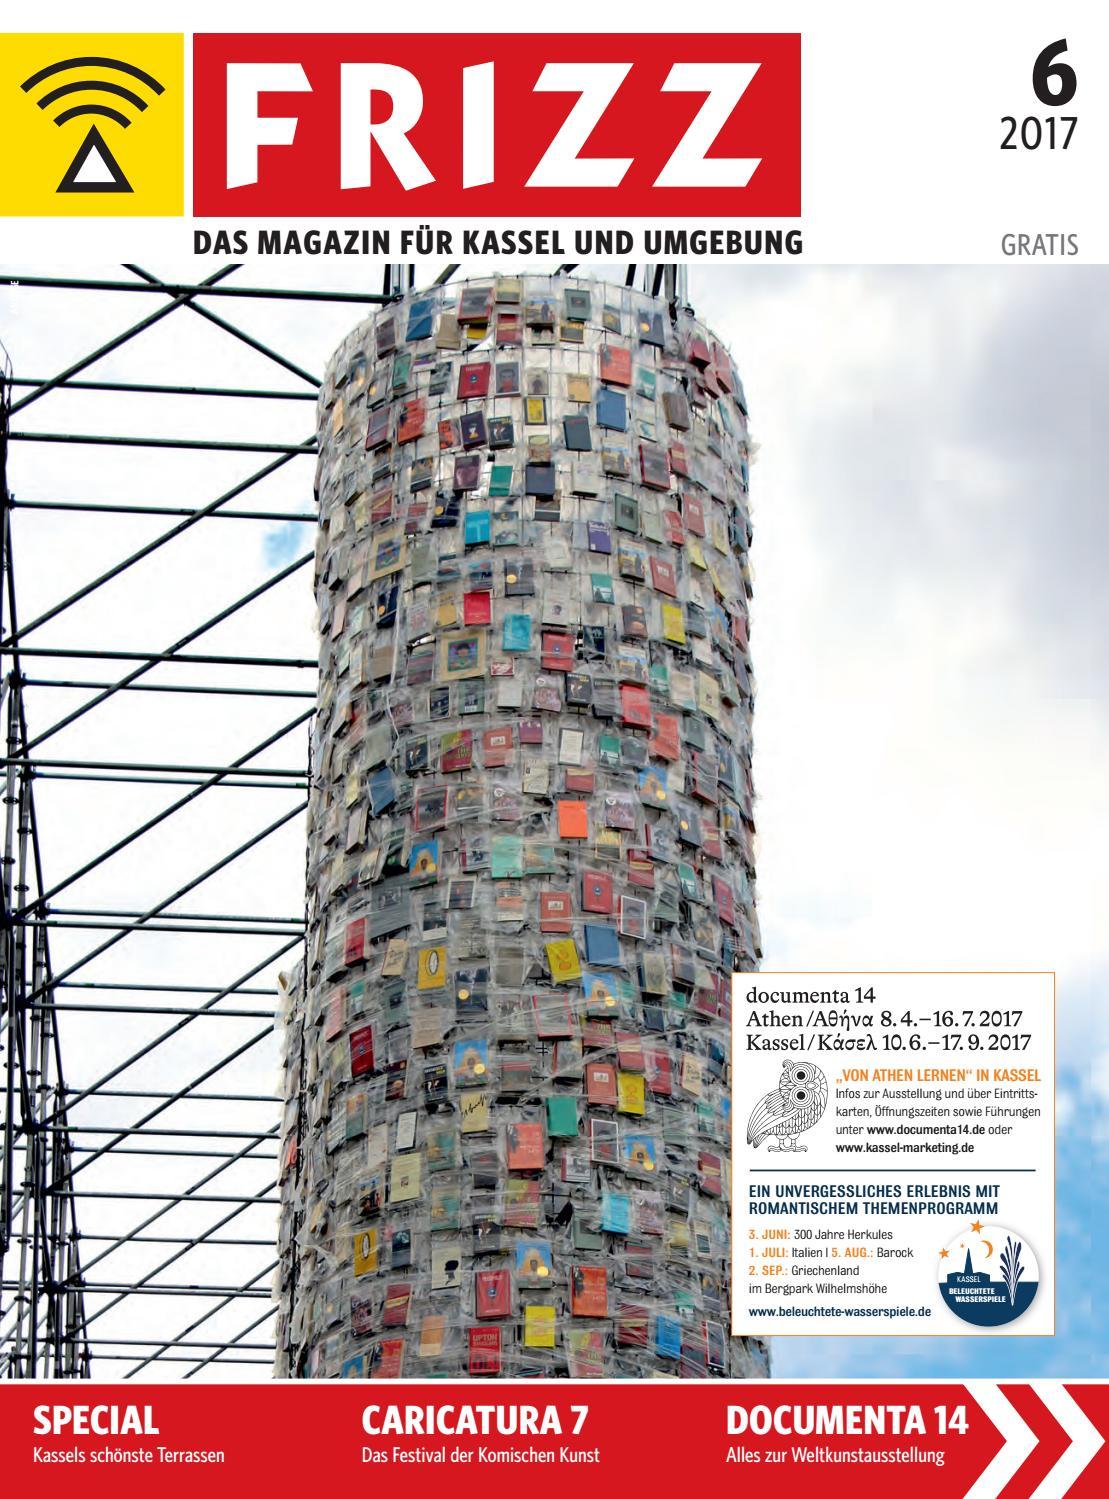 FRIZZ Das Magazin Kassel Juni 2017 by frizz kassel - issuu